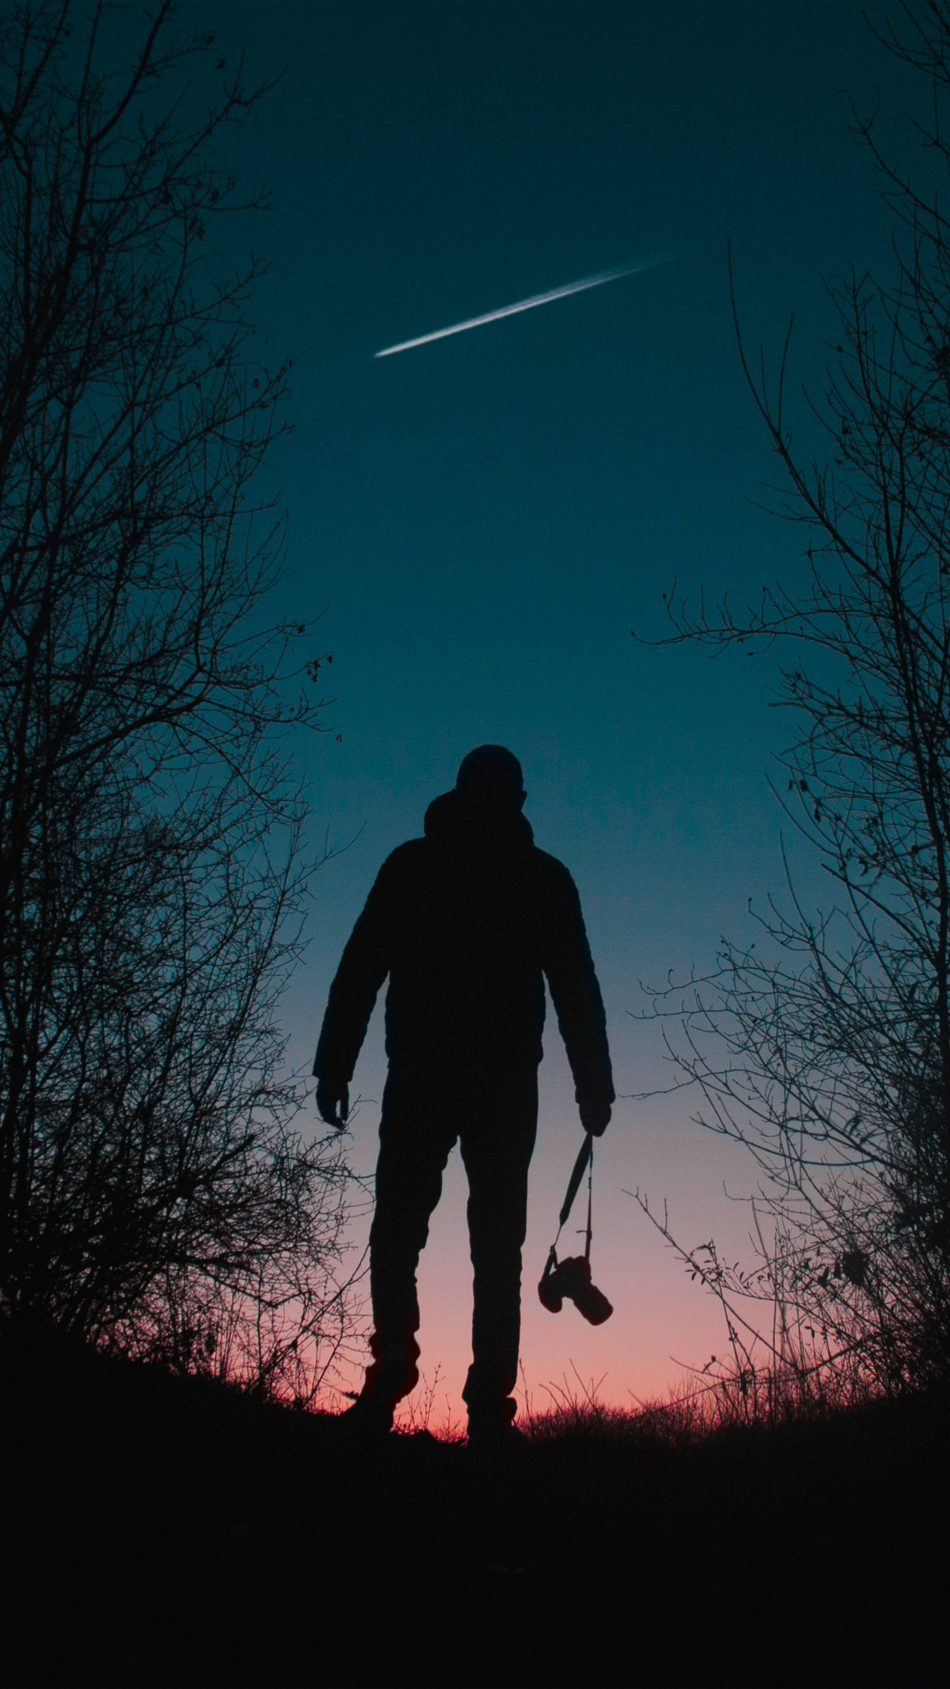 Photographer Silhouette Sunset Evening 4K Ultra HD Mobile Wallpaper